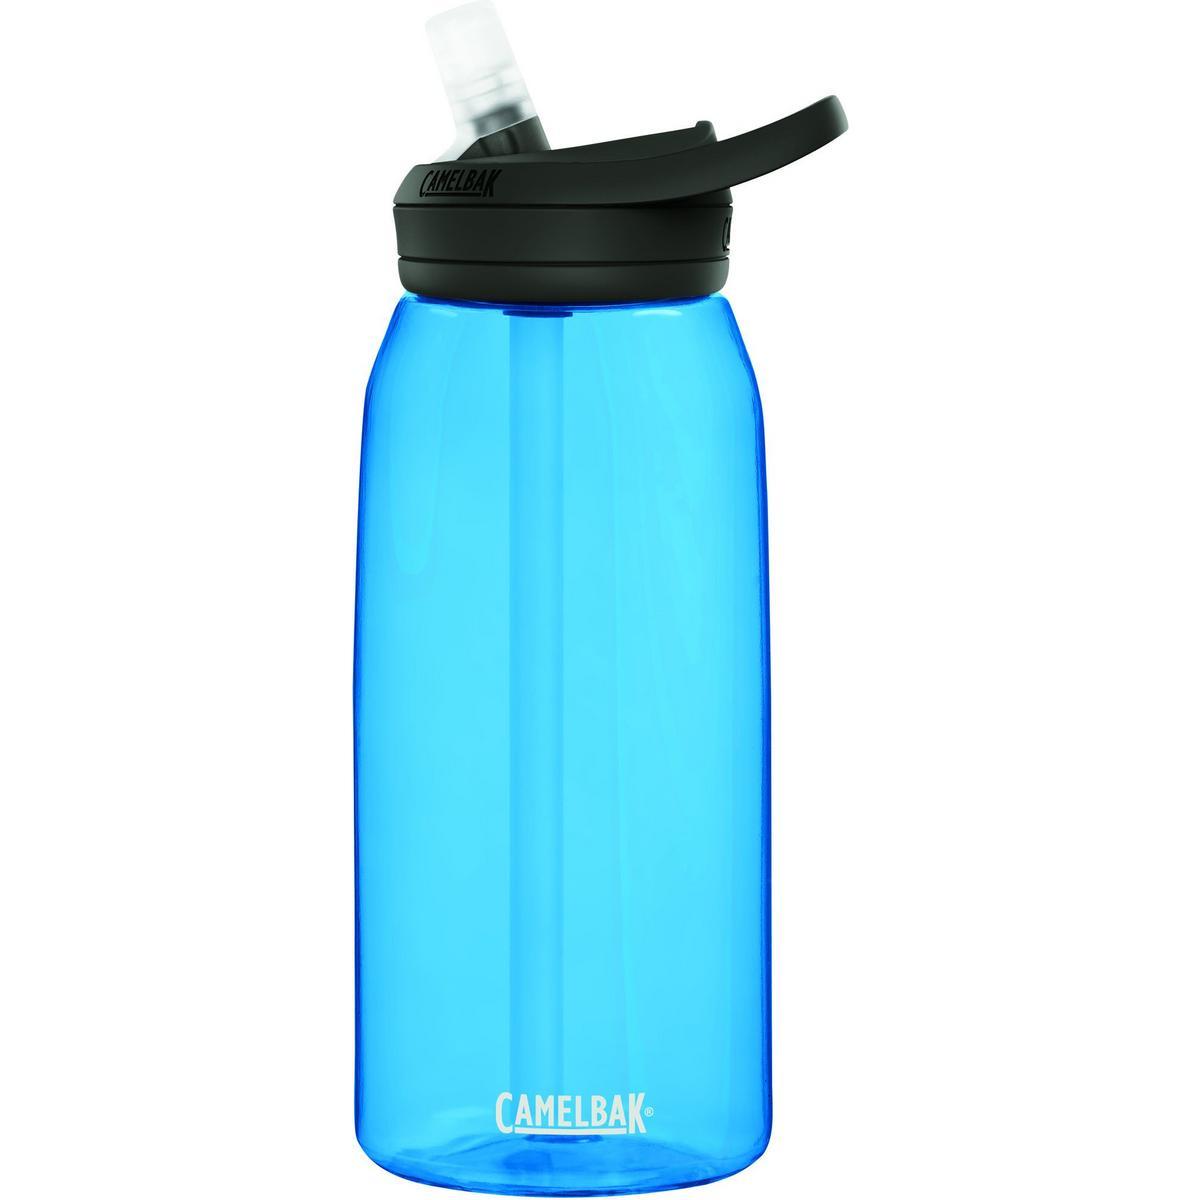 Camelbak Eddy + Bottle 1L